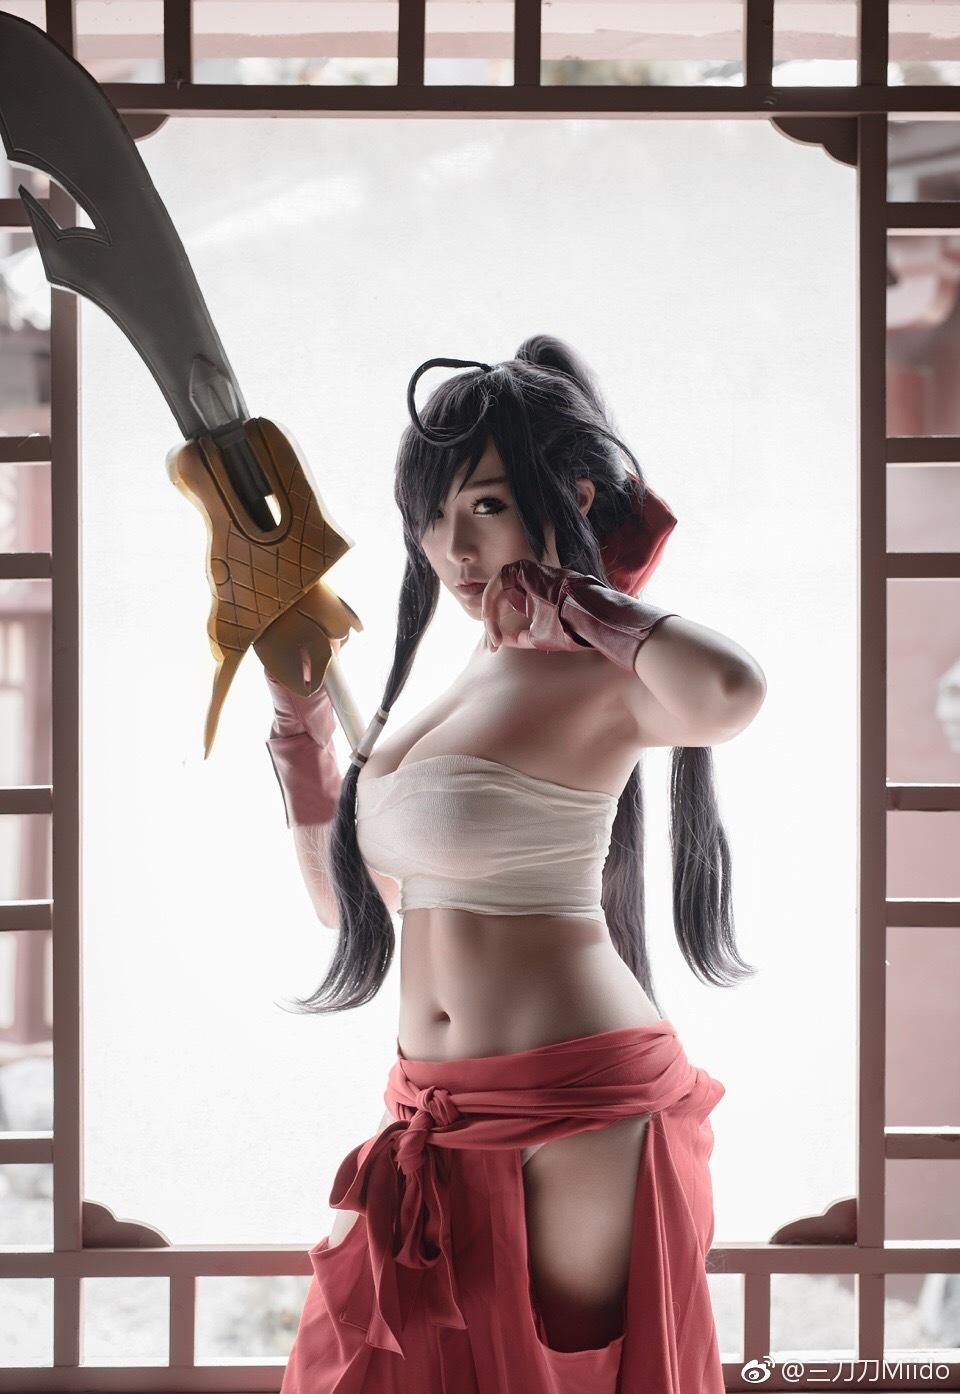 Unchou Kanu, 三刀刀Miido, фото, косплей, девушка, Ikkitousen, cosplay